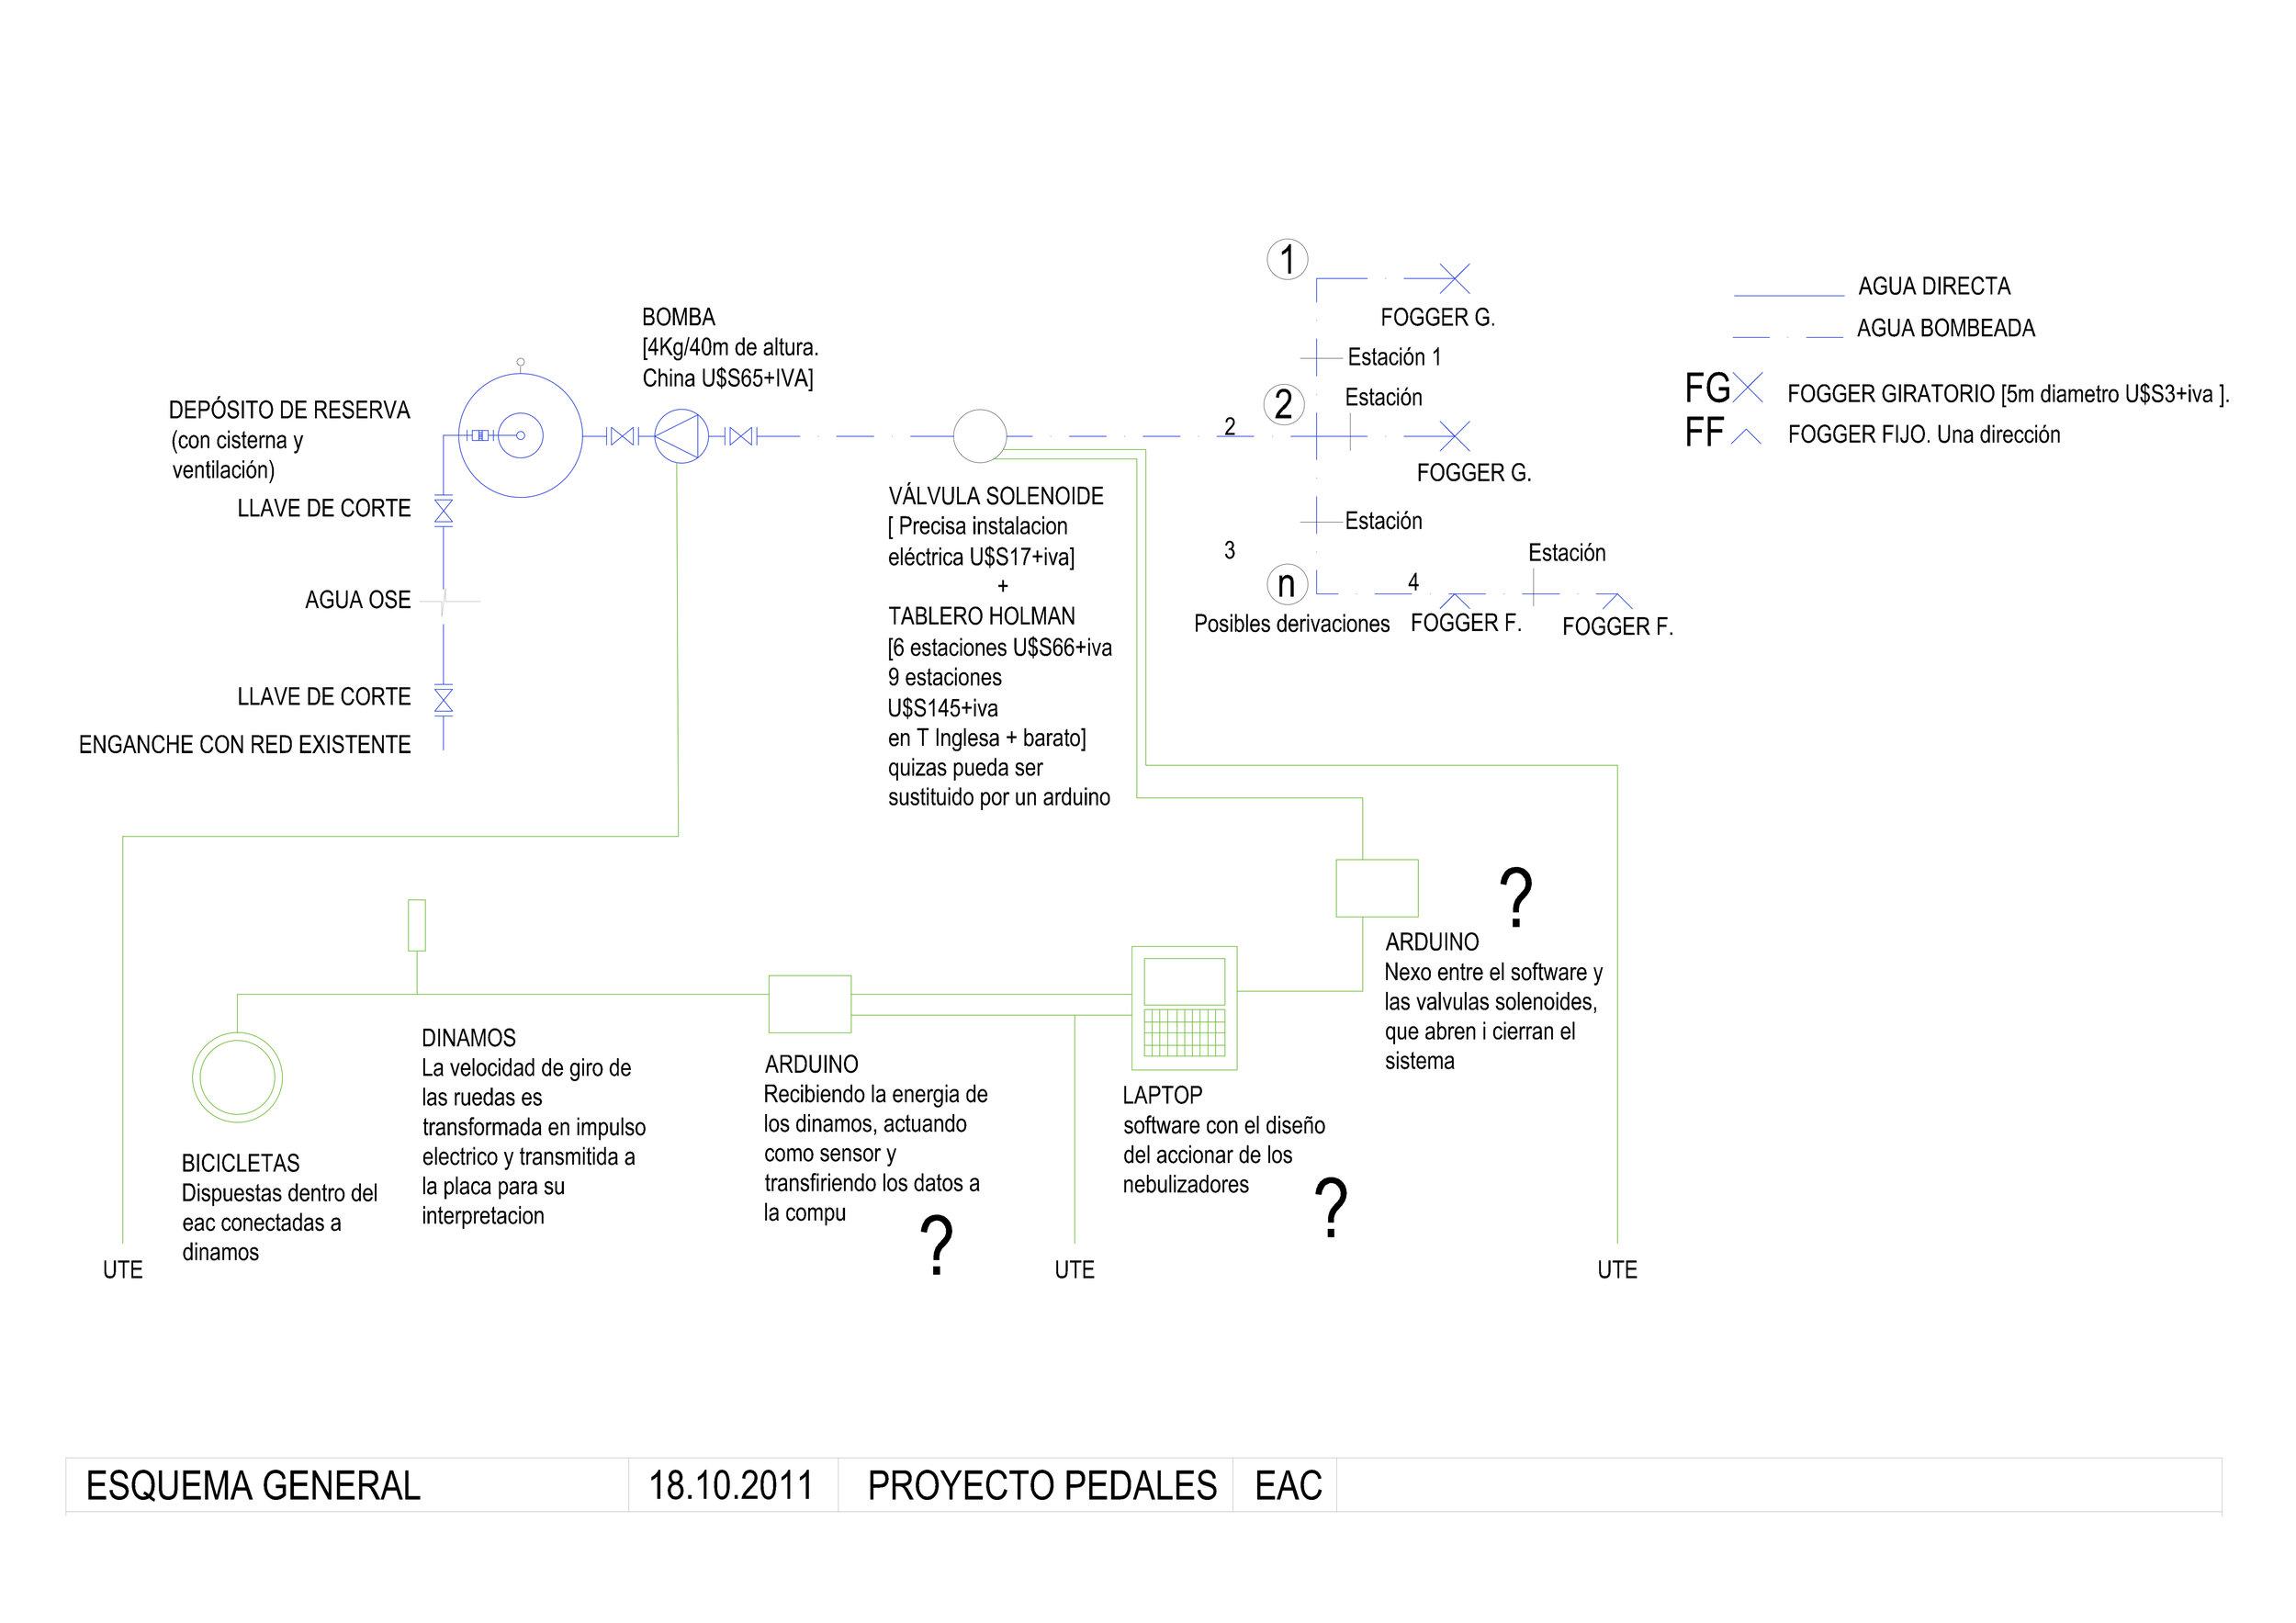 esquema general pedales-hoja 1.jpg